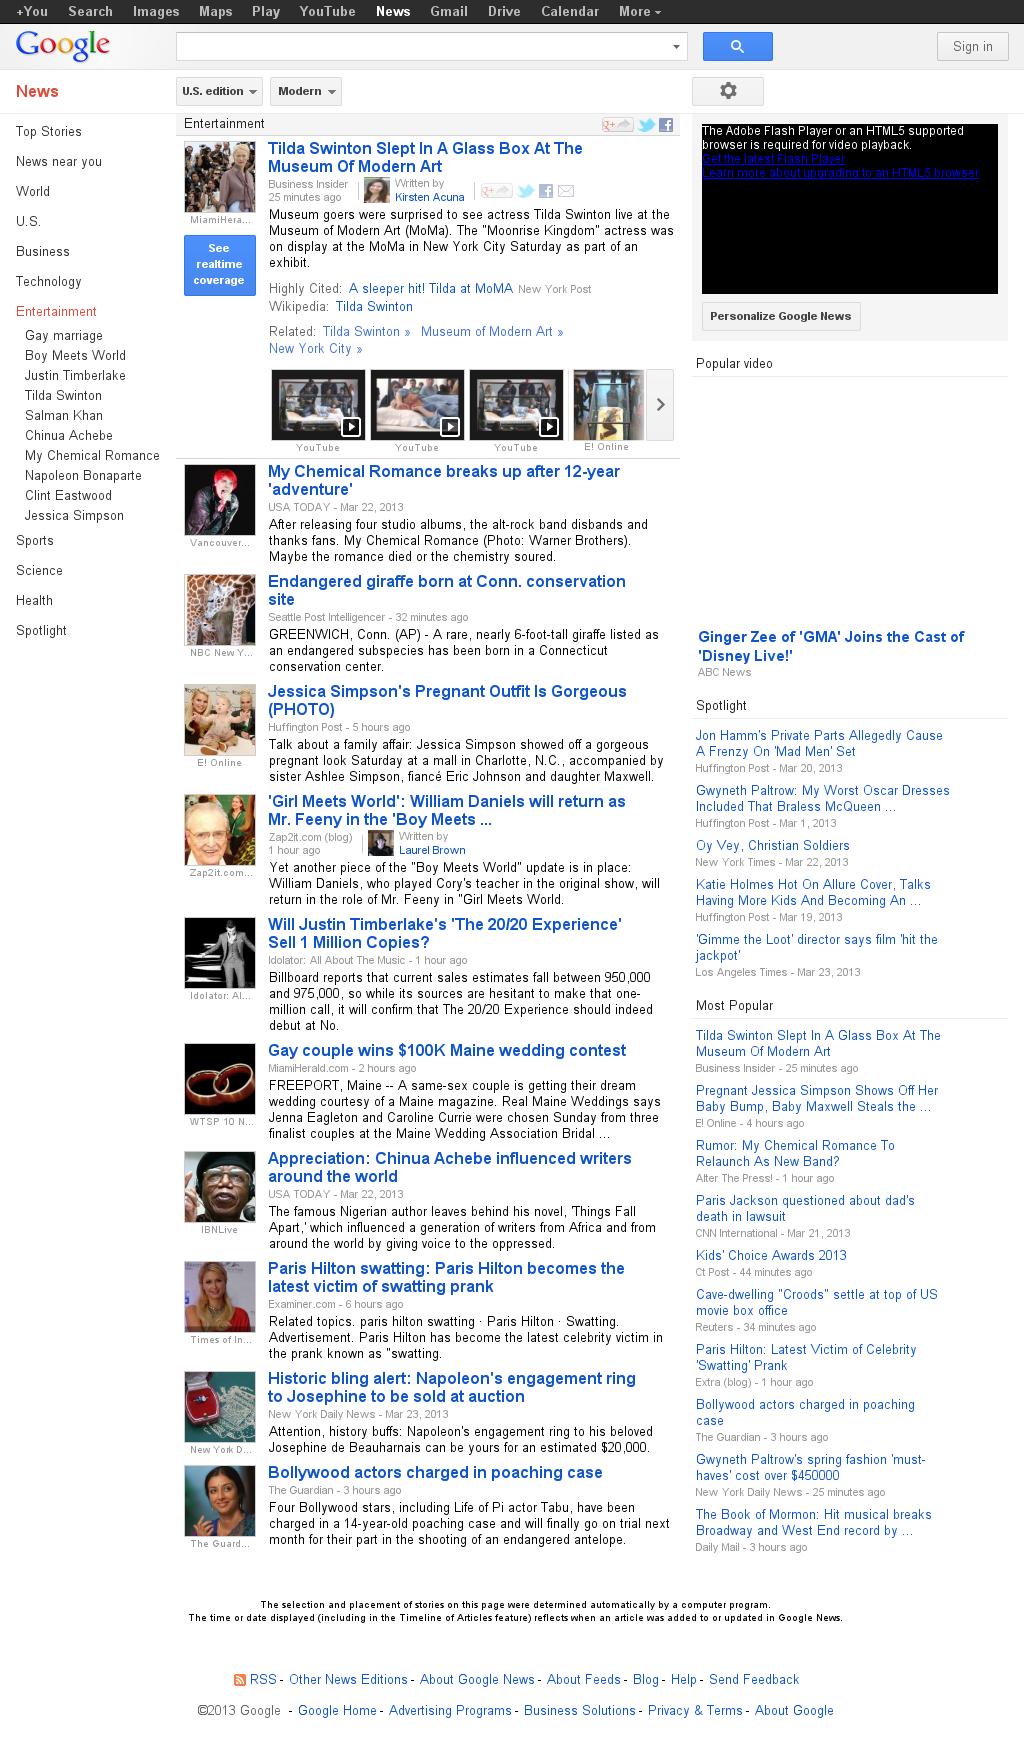 Google News: Entertainment at Sunday March 24, 2013, 9:15 p.m. UTC